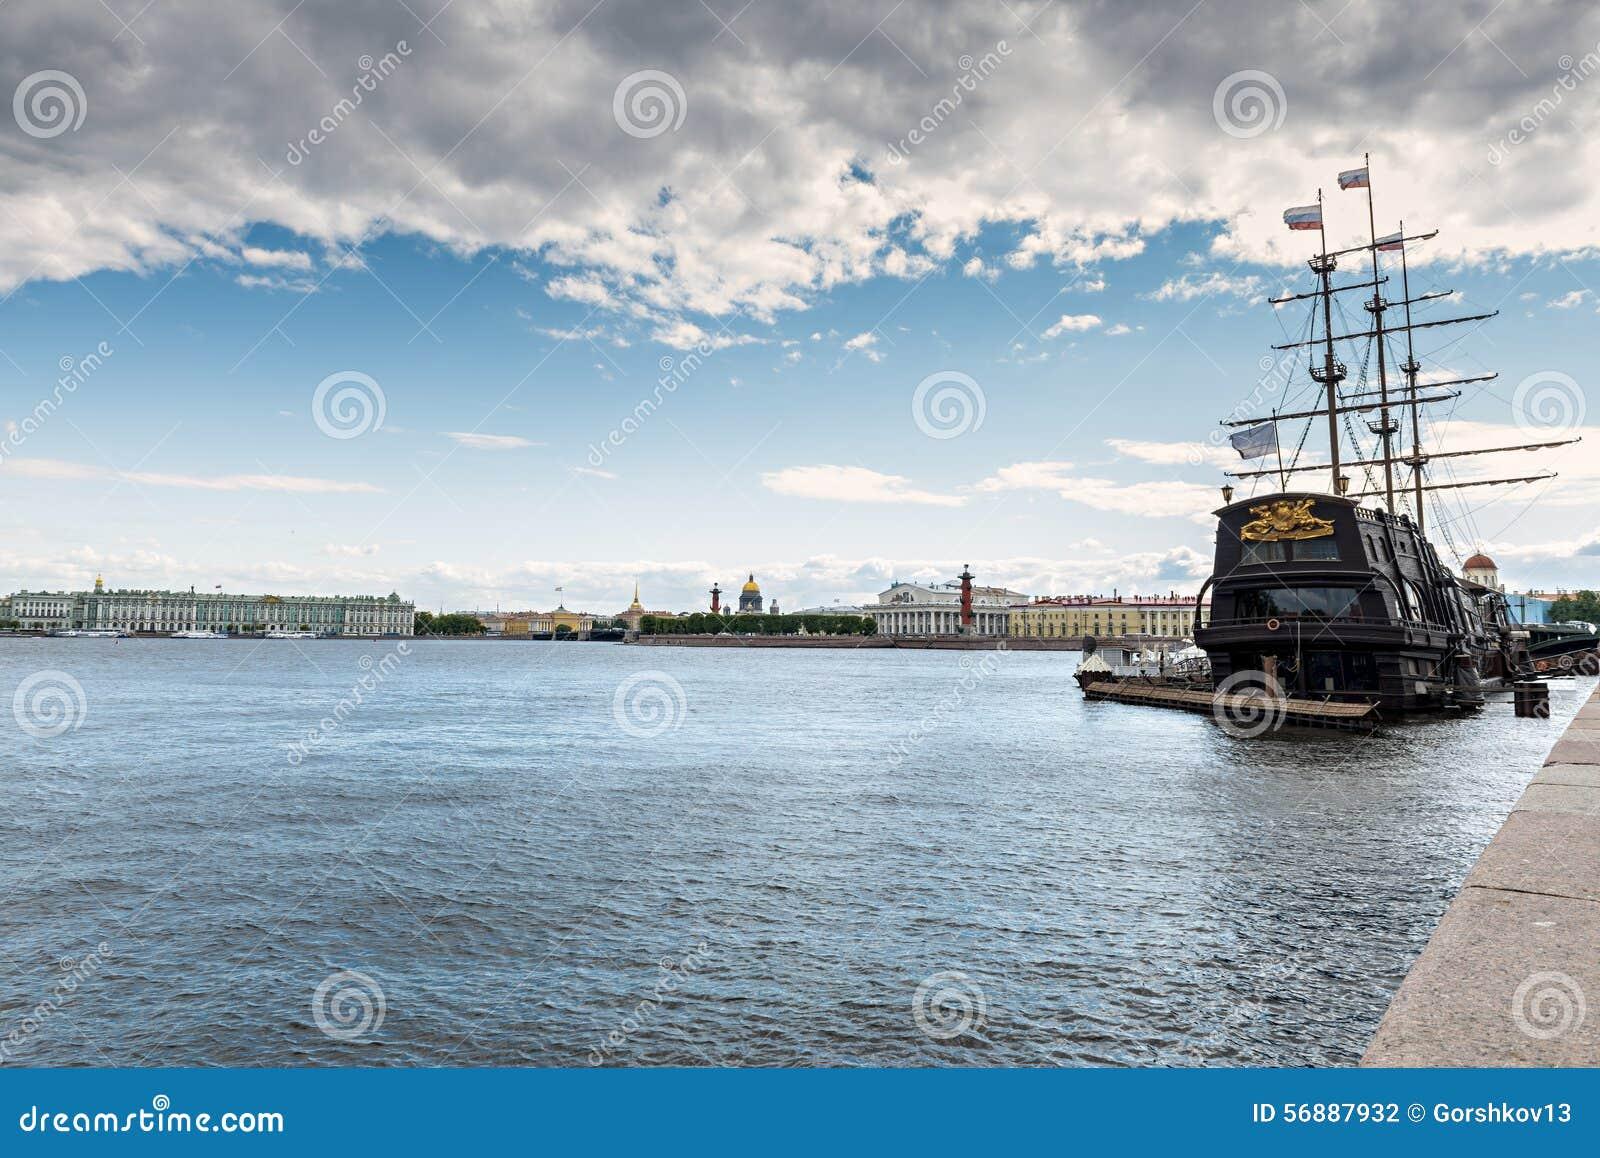 Vista panoramica sul centro storico di Sankt Pietroburgo